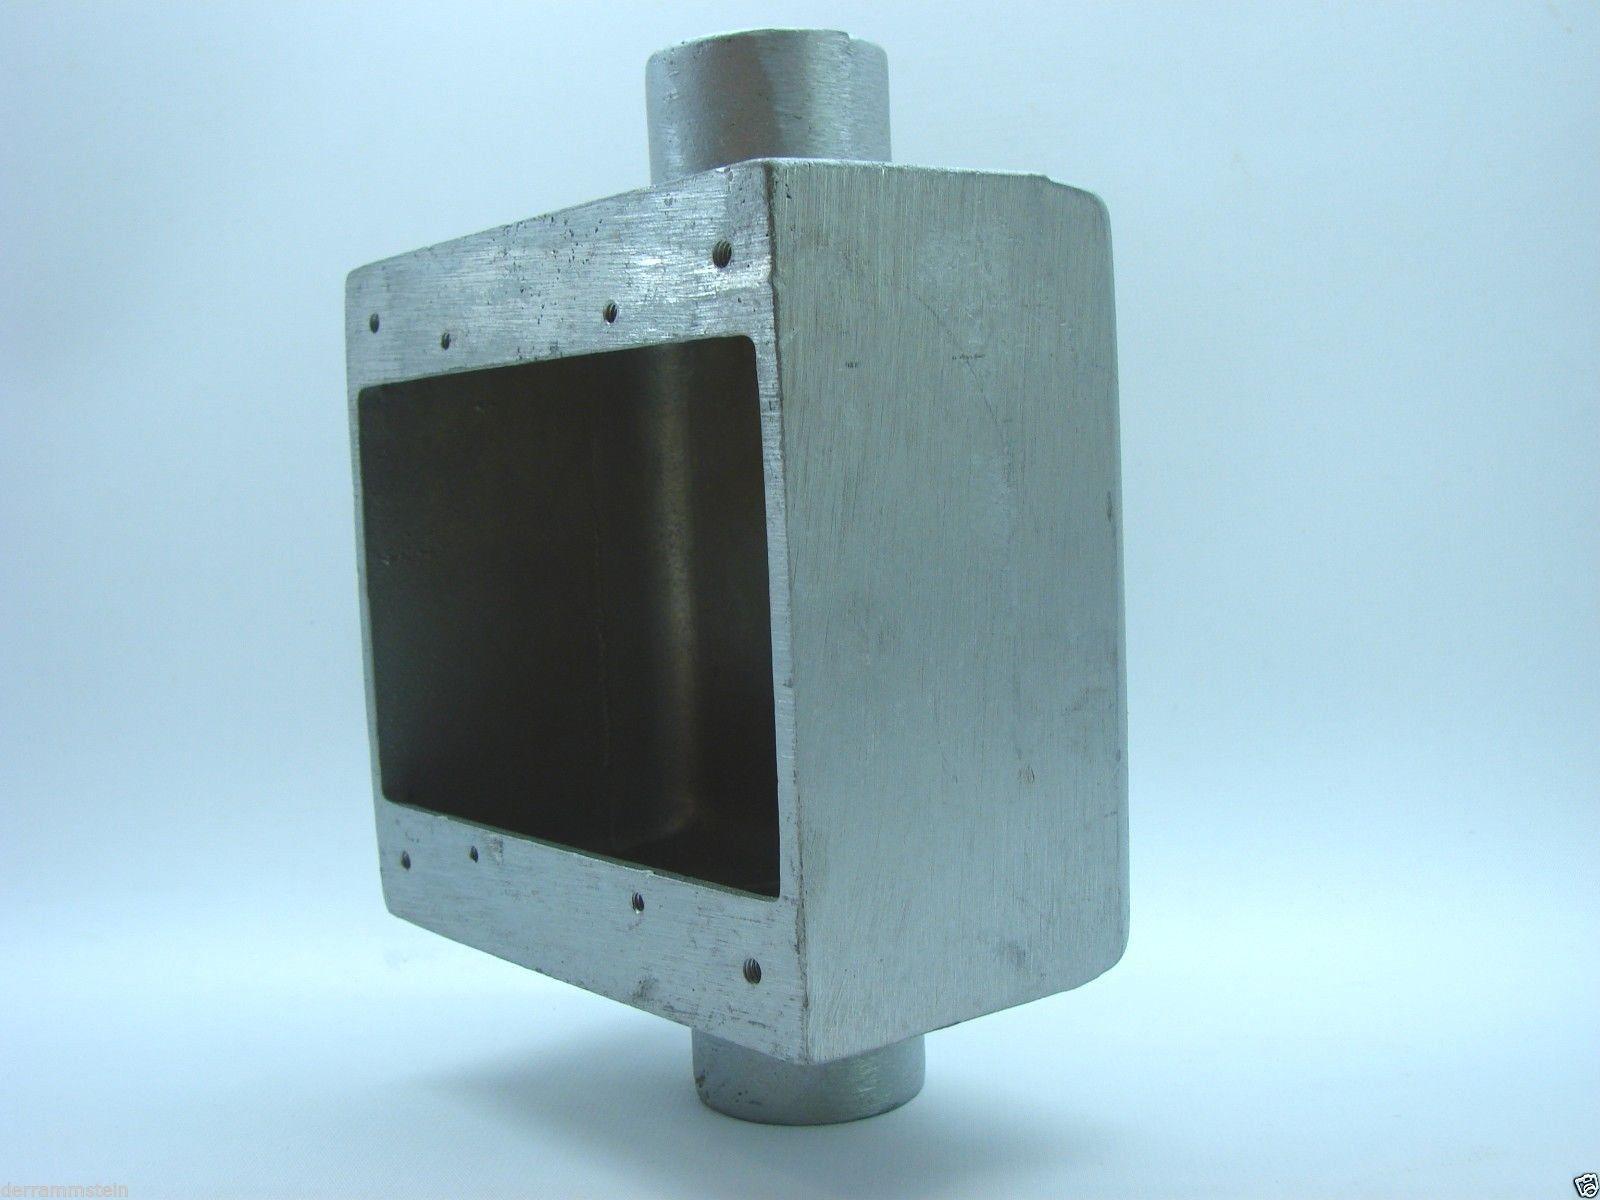 "Hubbell FD20-2 FD Pin & Sleeve Device Back Box 1"" Hubs 2-1/2"" Deep 47 CU.IN.t6"